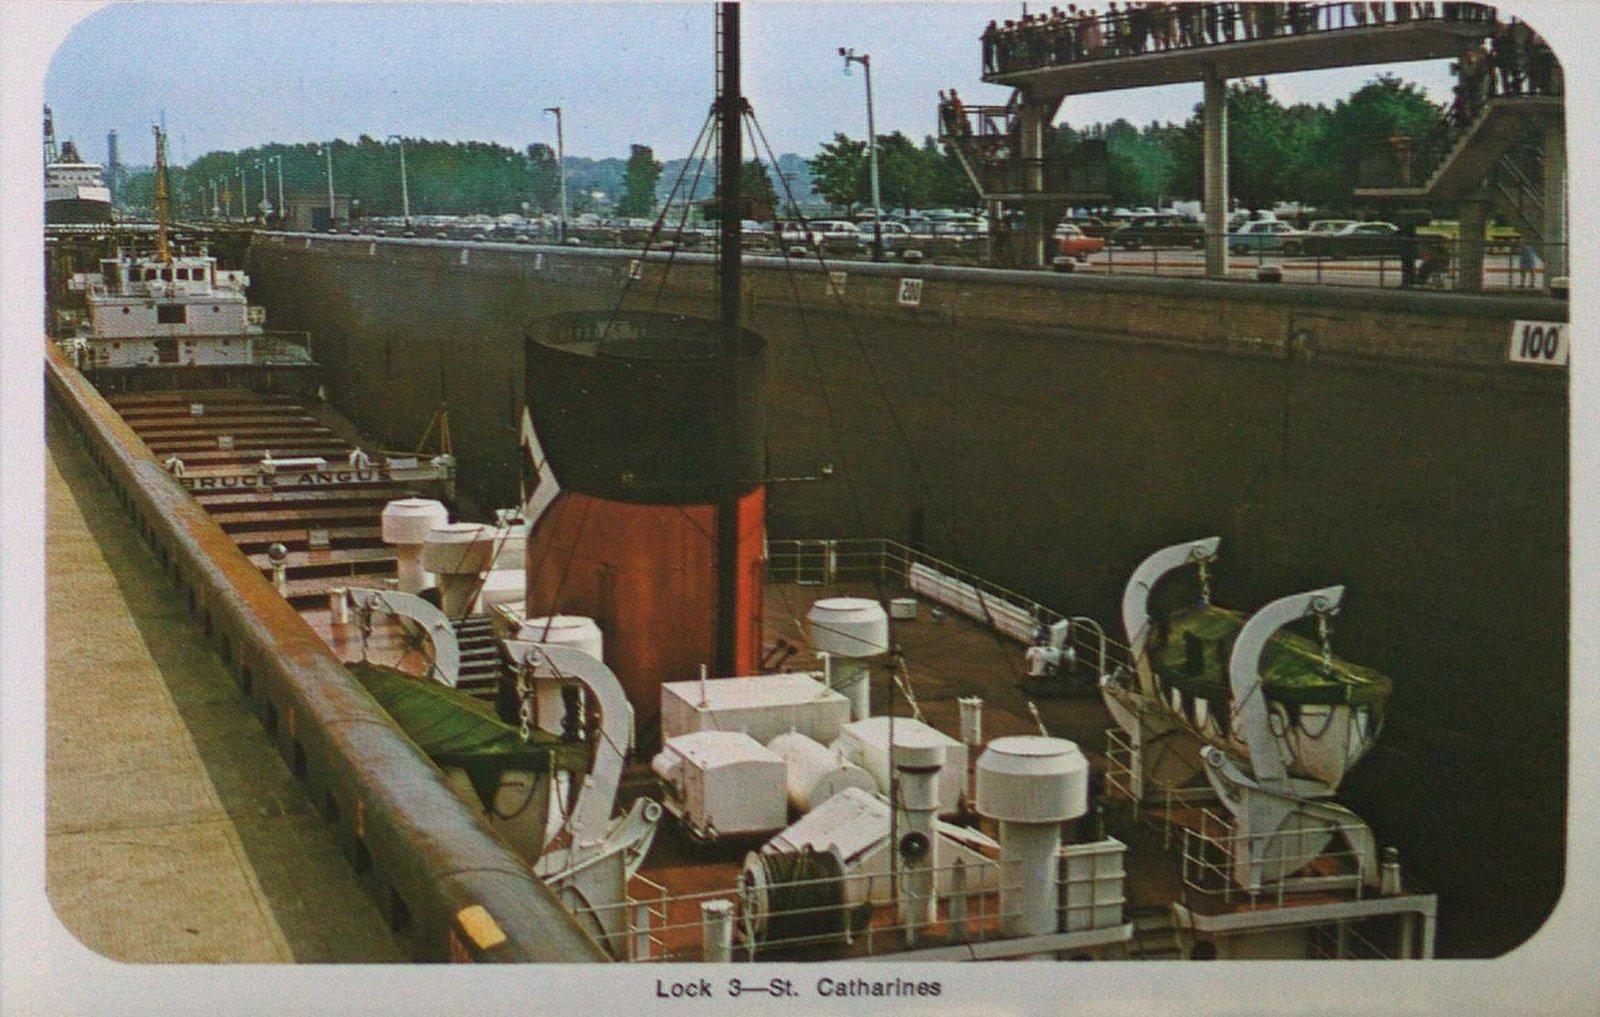 Lock Three on the Welland Ship Canal